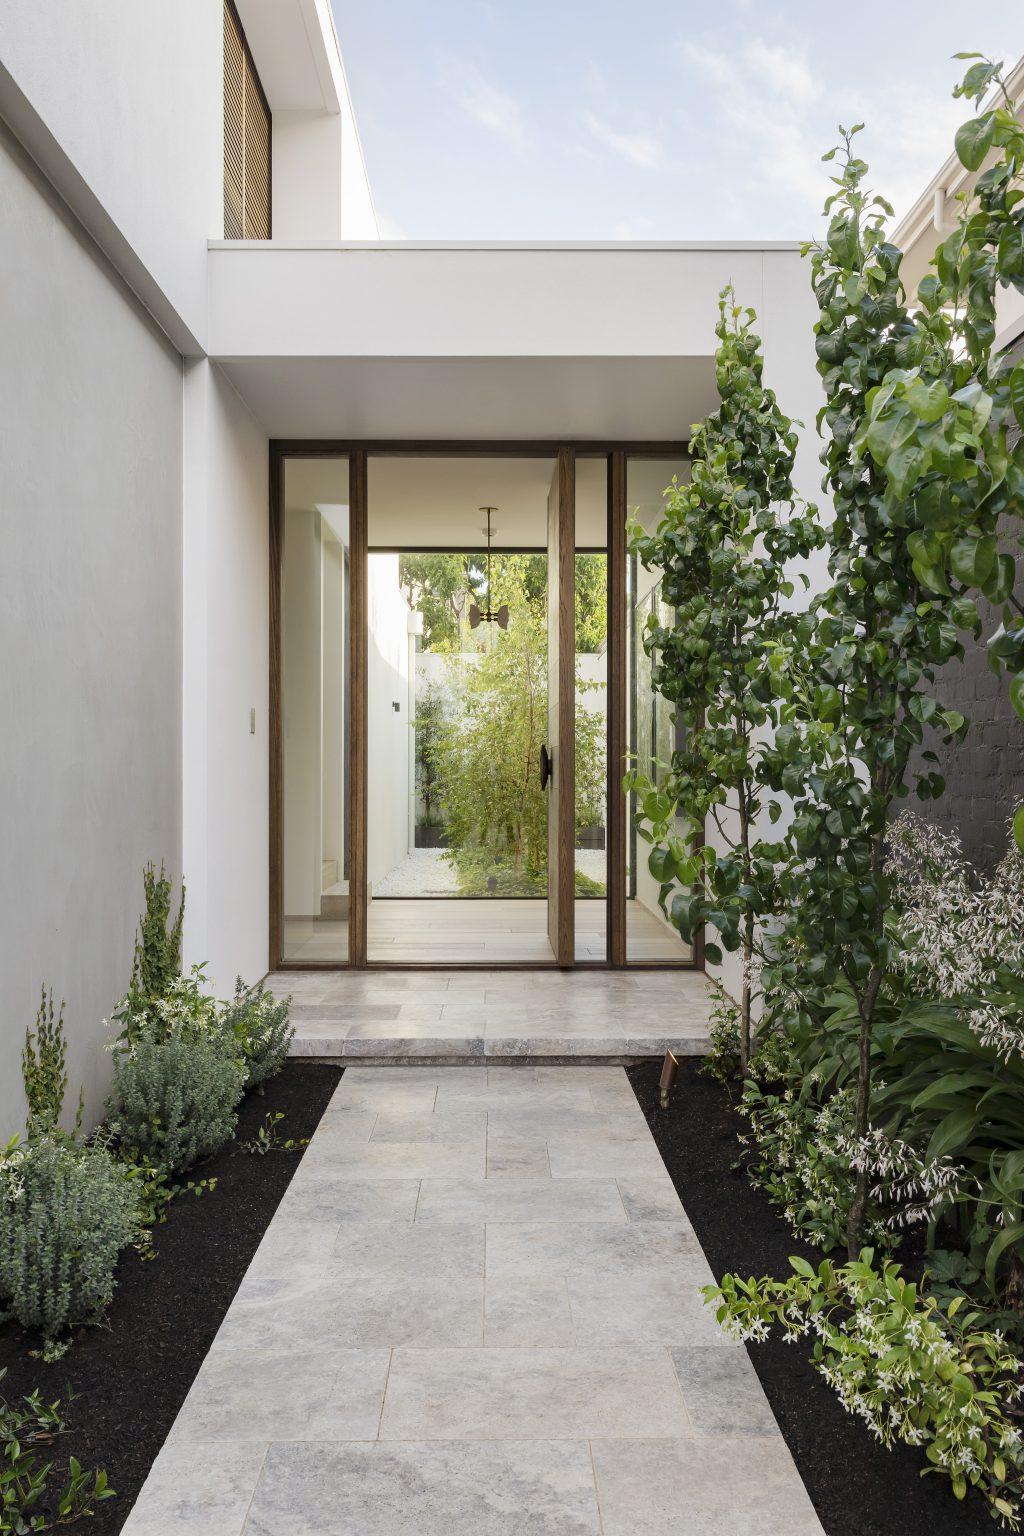 architectural-house-exterior-door-2021-04-03-23-38-06-utc